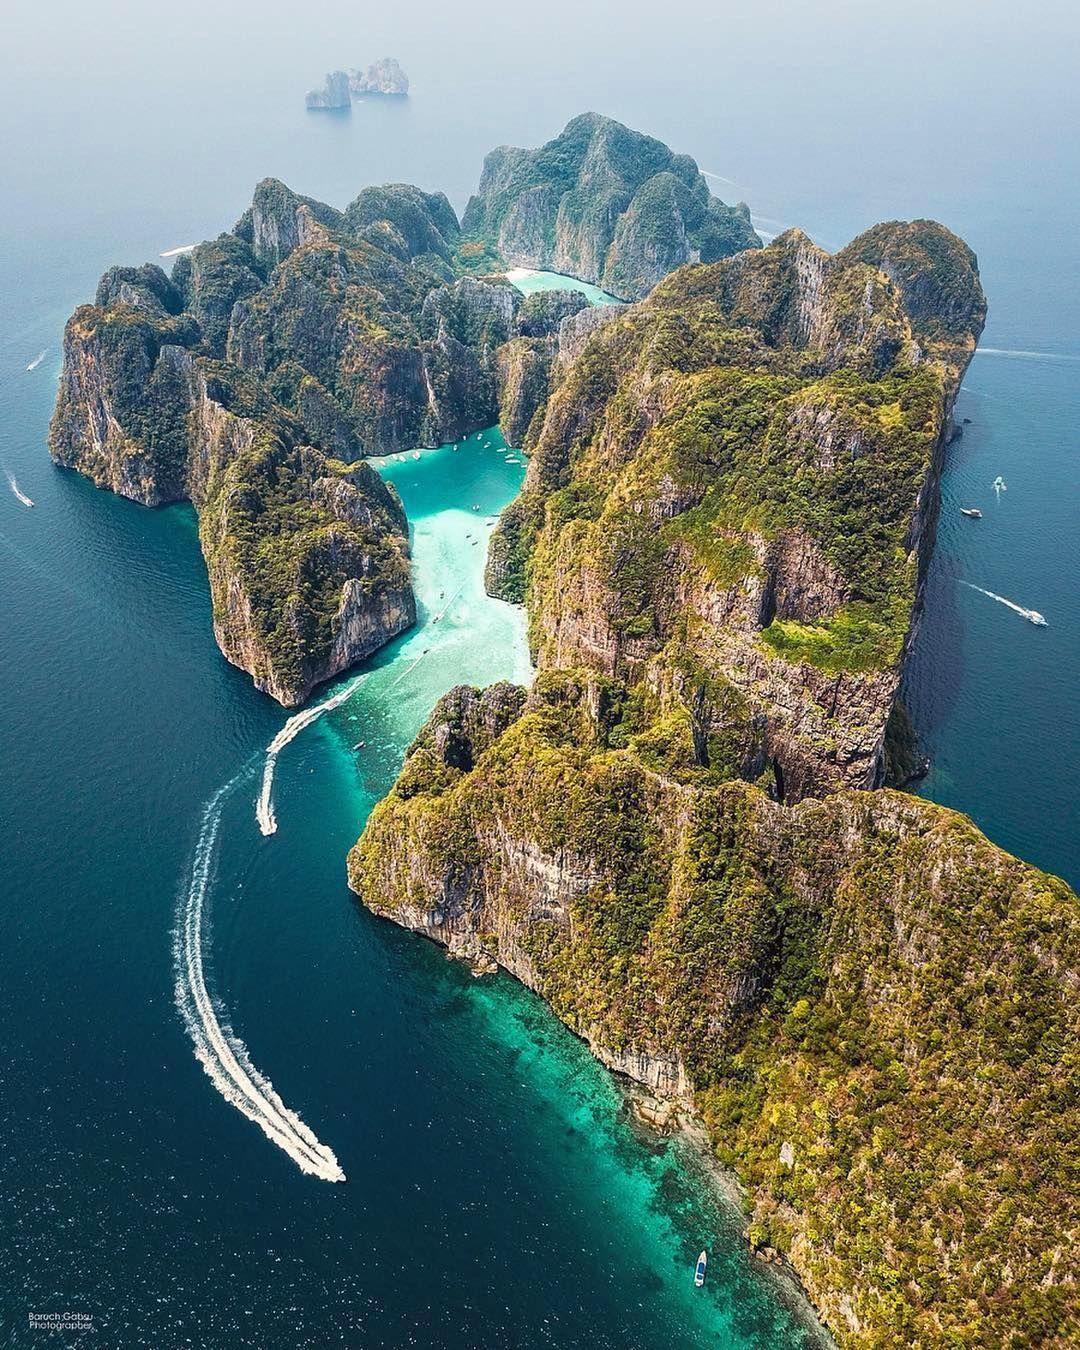 Phi Phi Island: Phi Phi Islands Photography By Baruch_gabsu